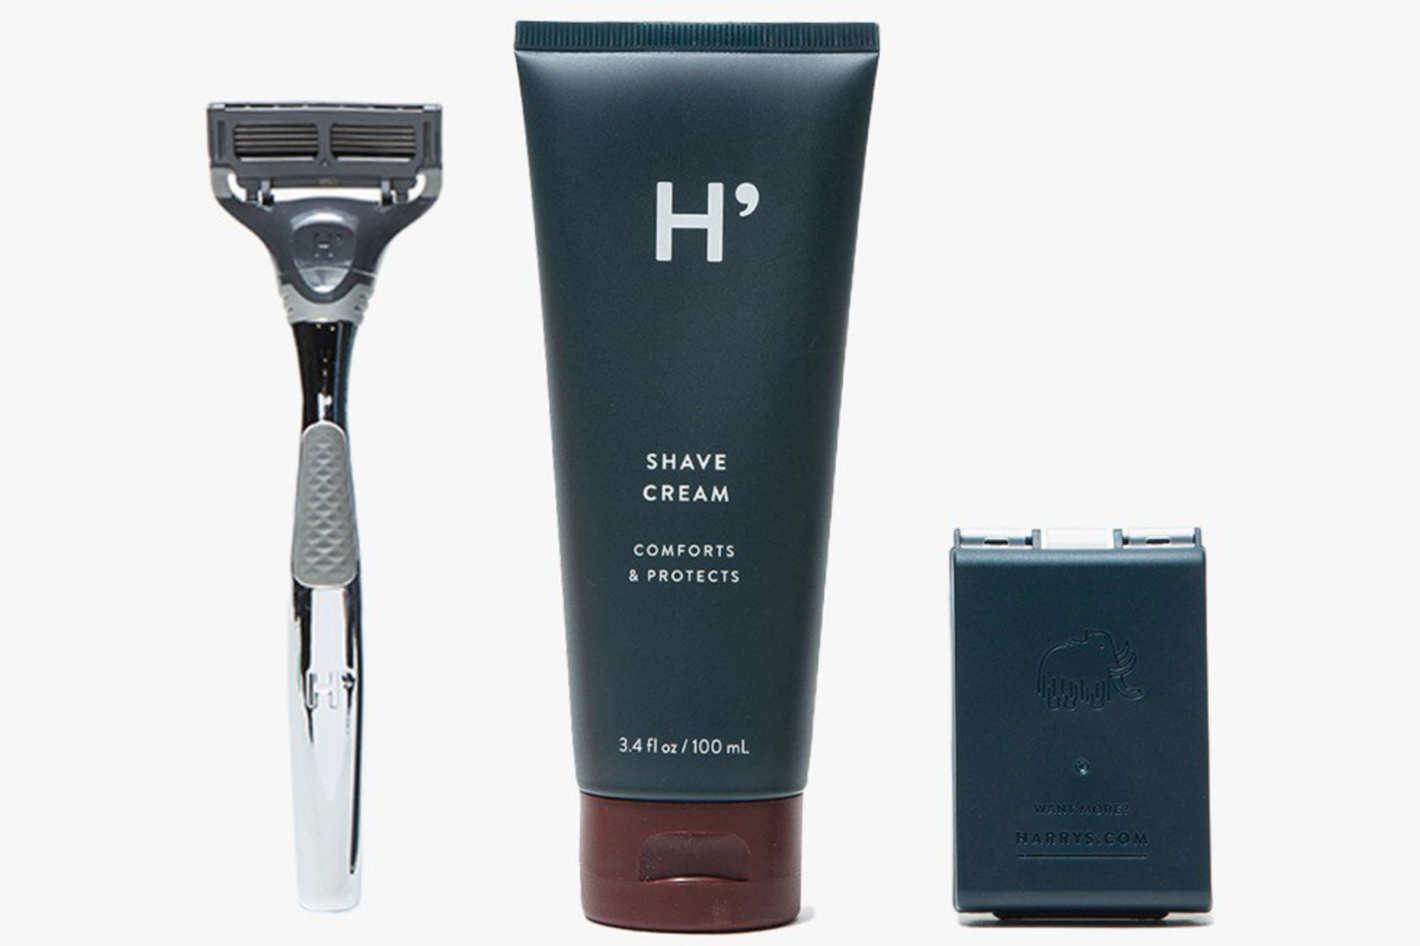 Harry's Chrome Winston Set + Shave Cream